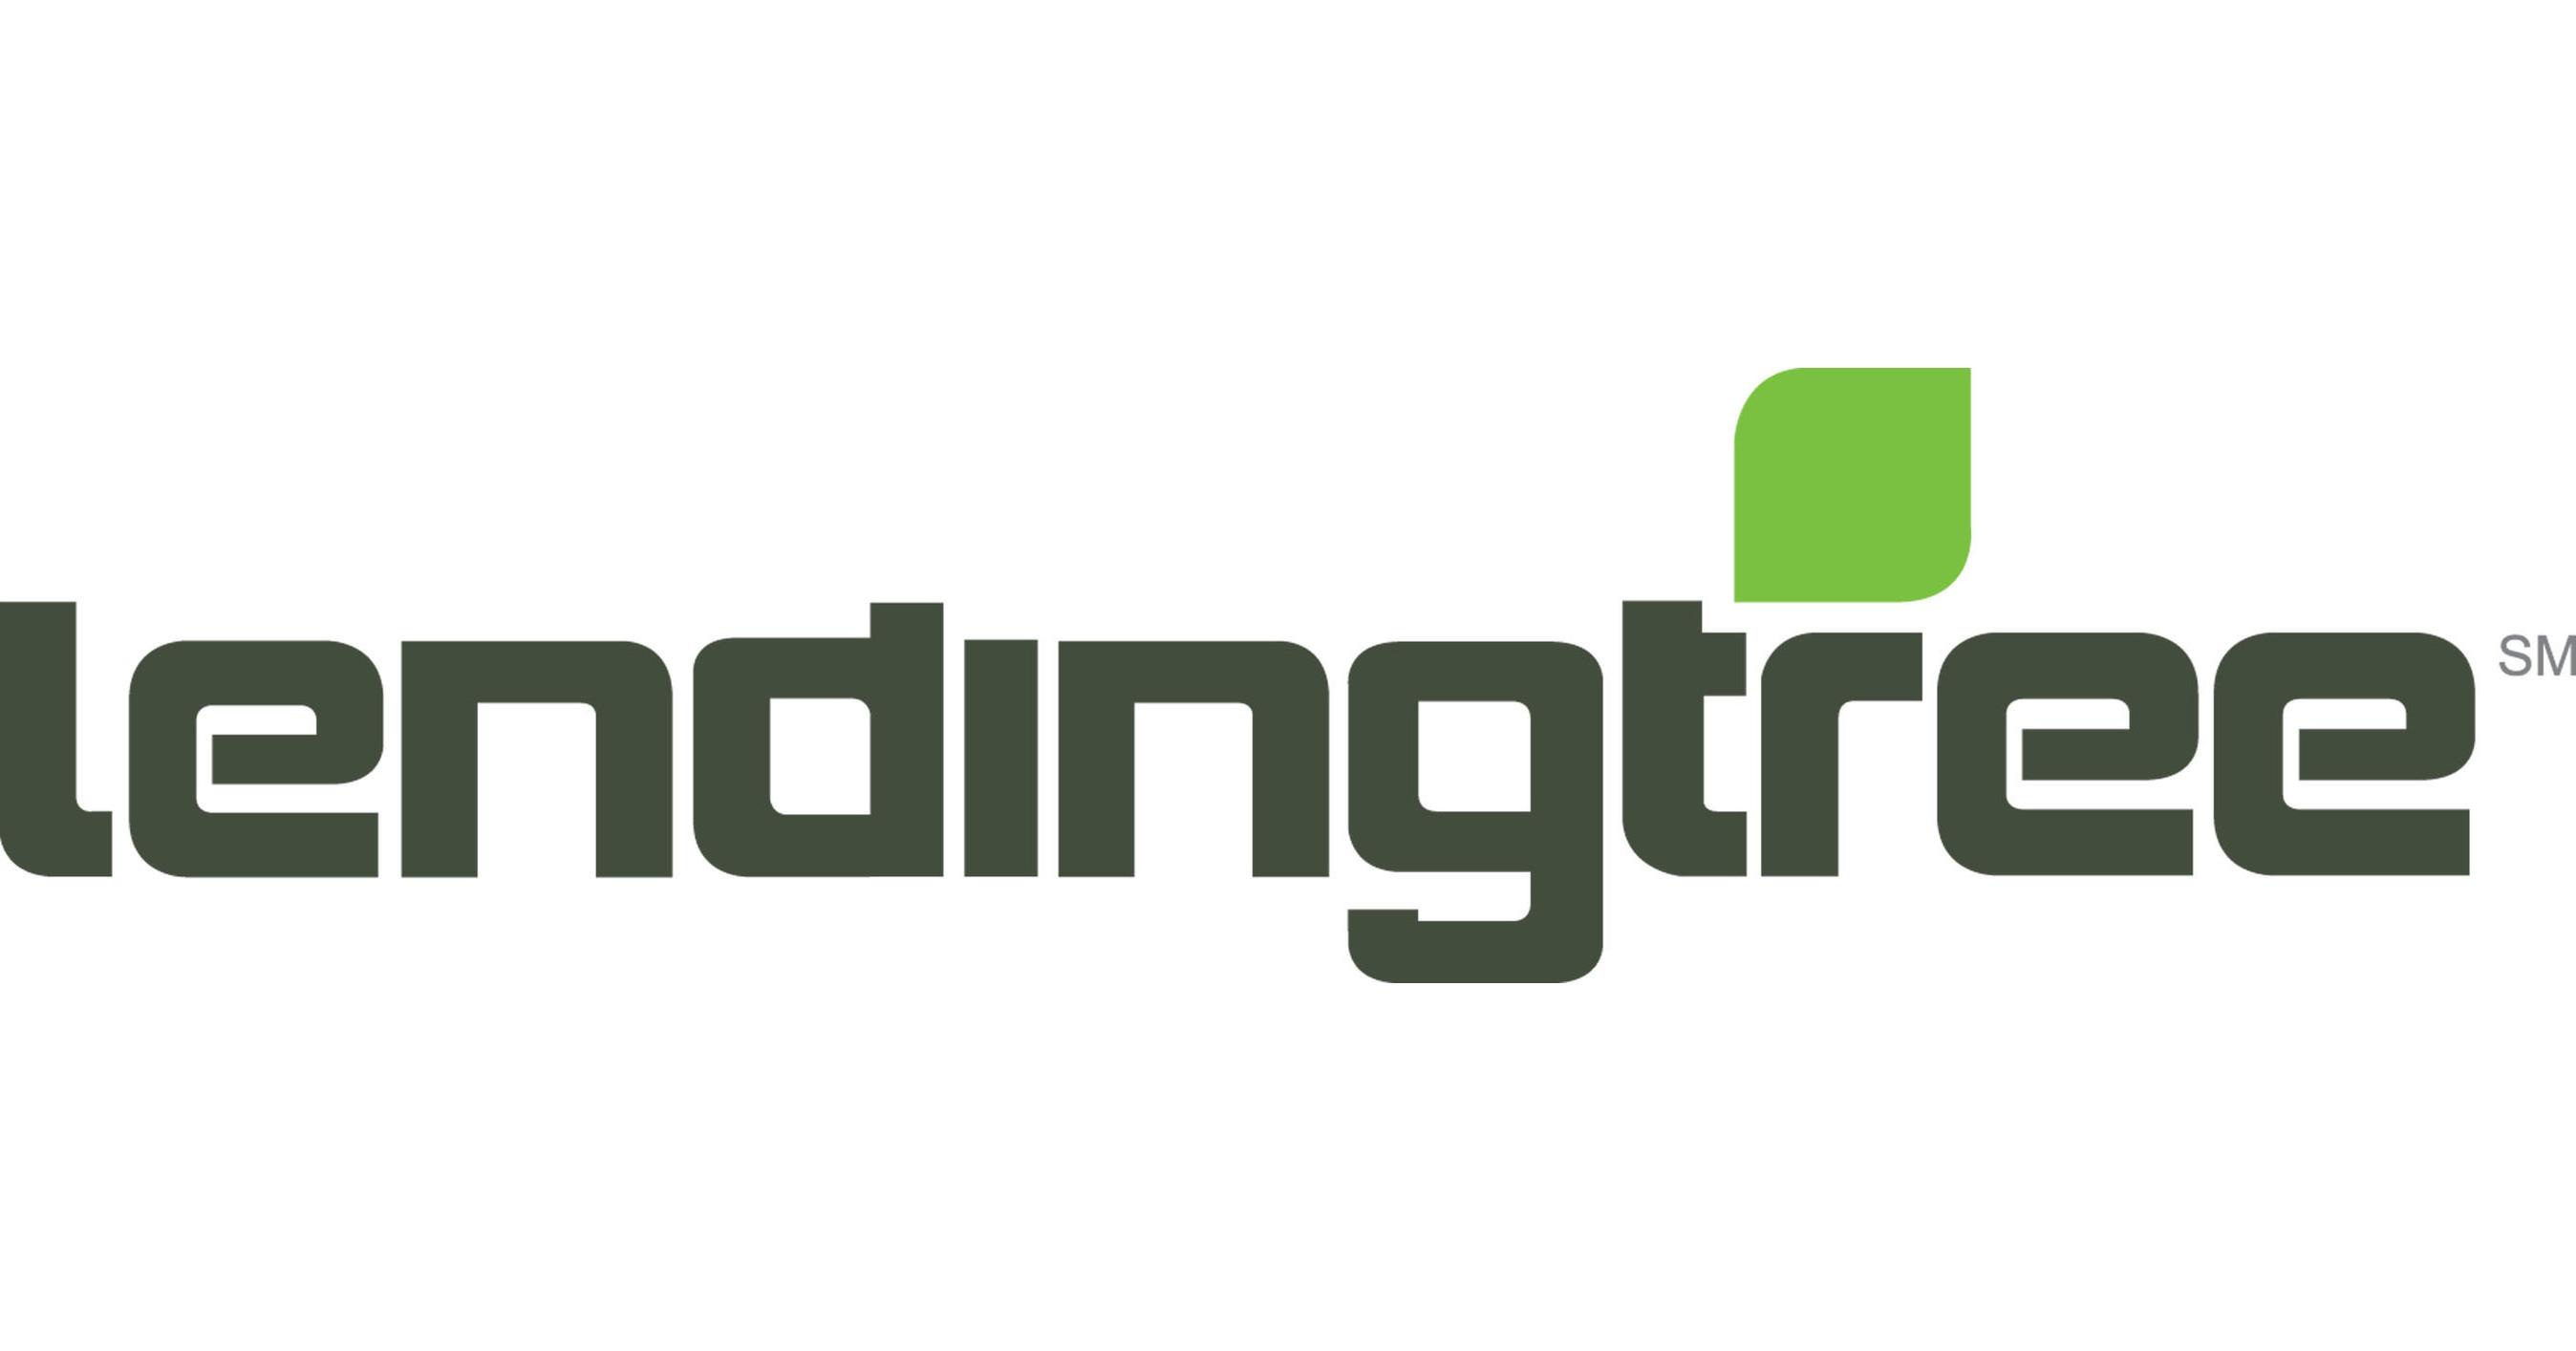 lendingtree Portland, OR Clarity Capital Management